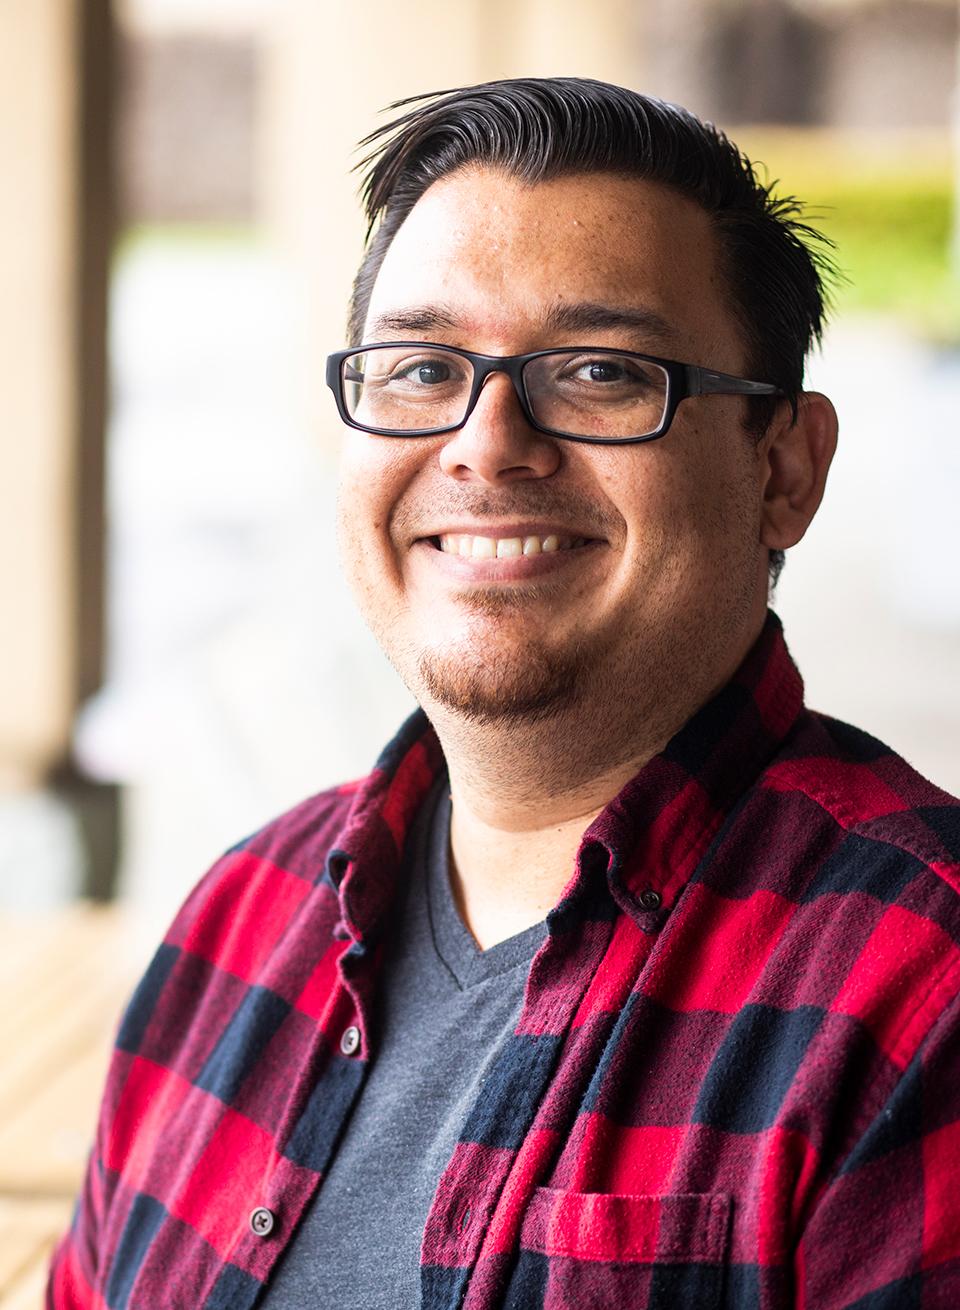 Smiling latino male student